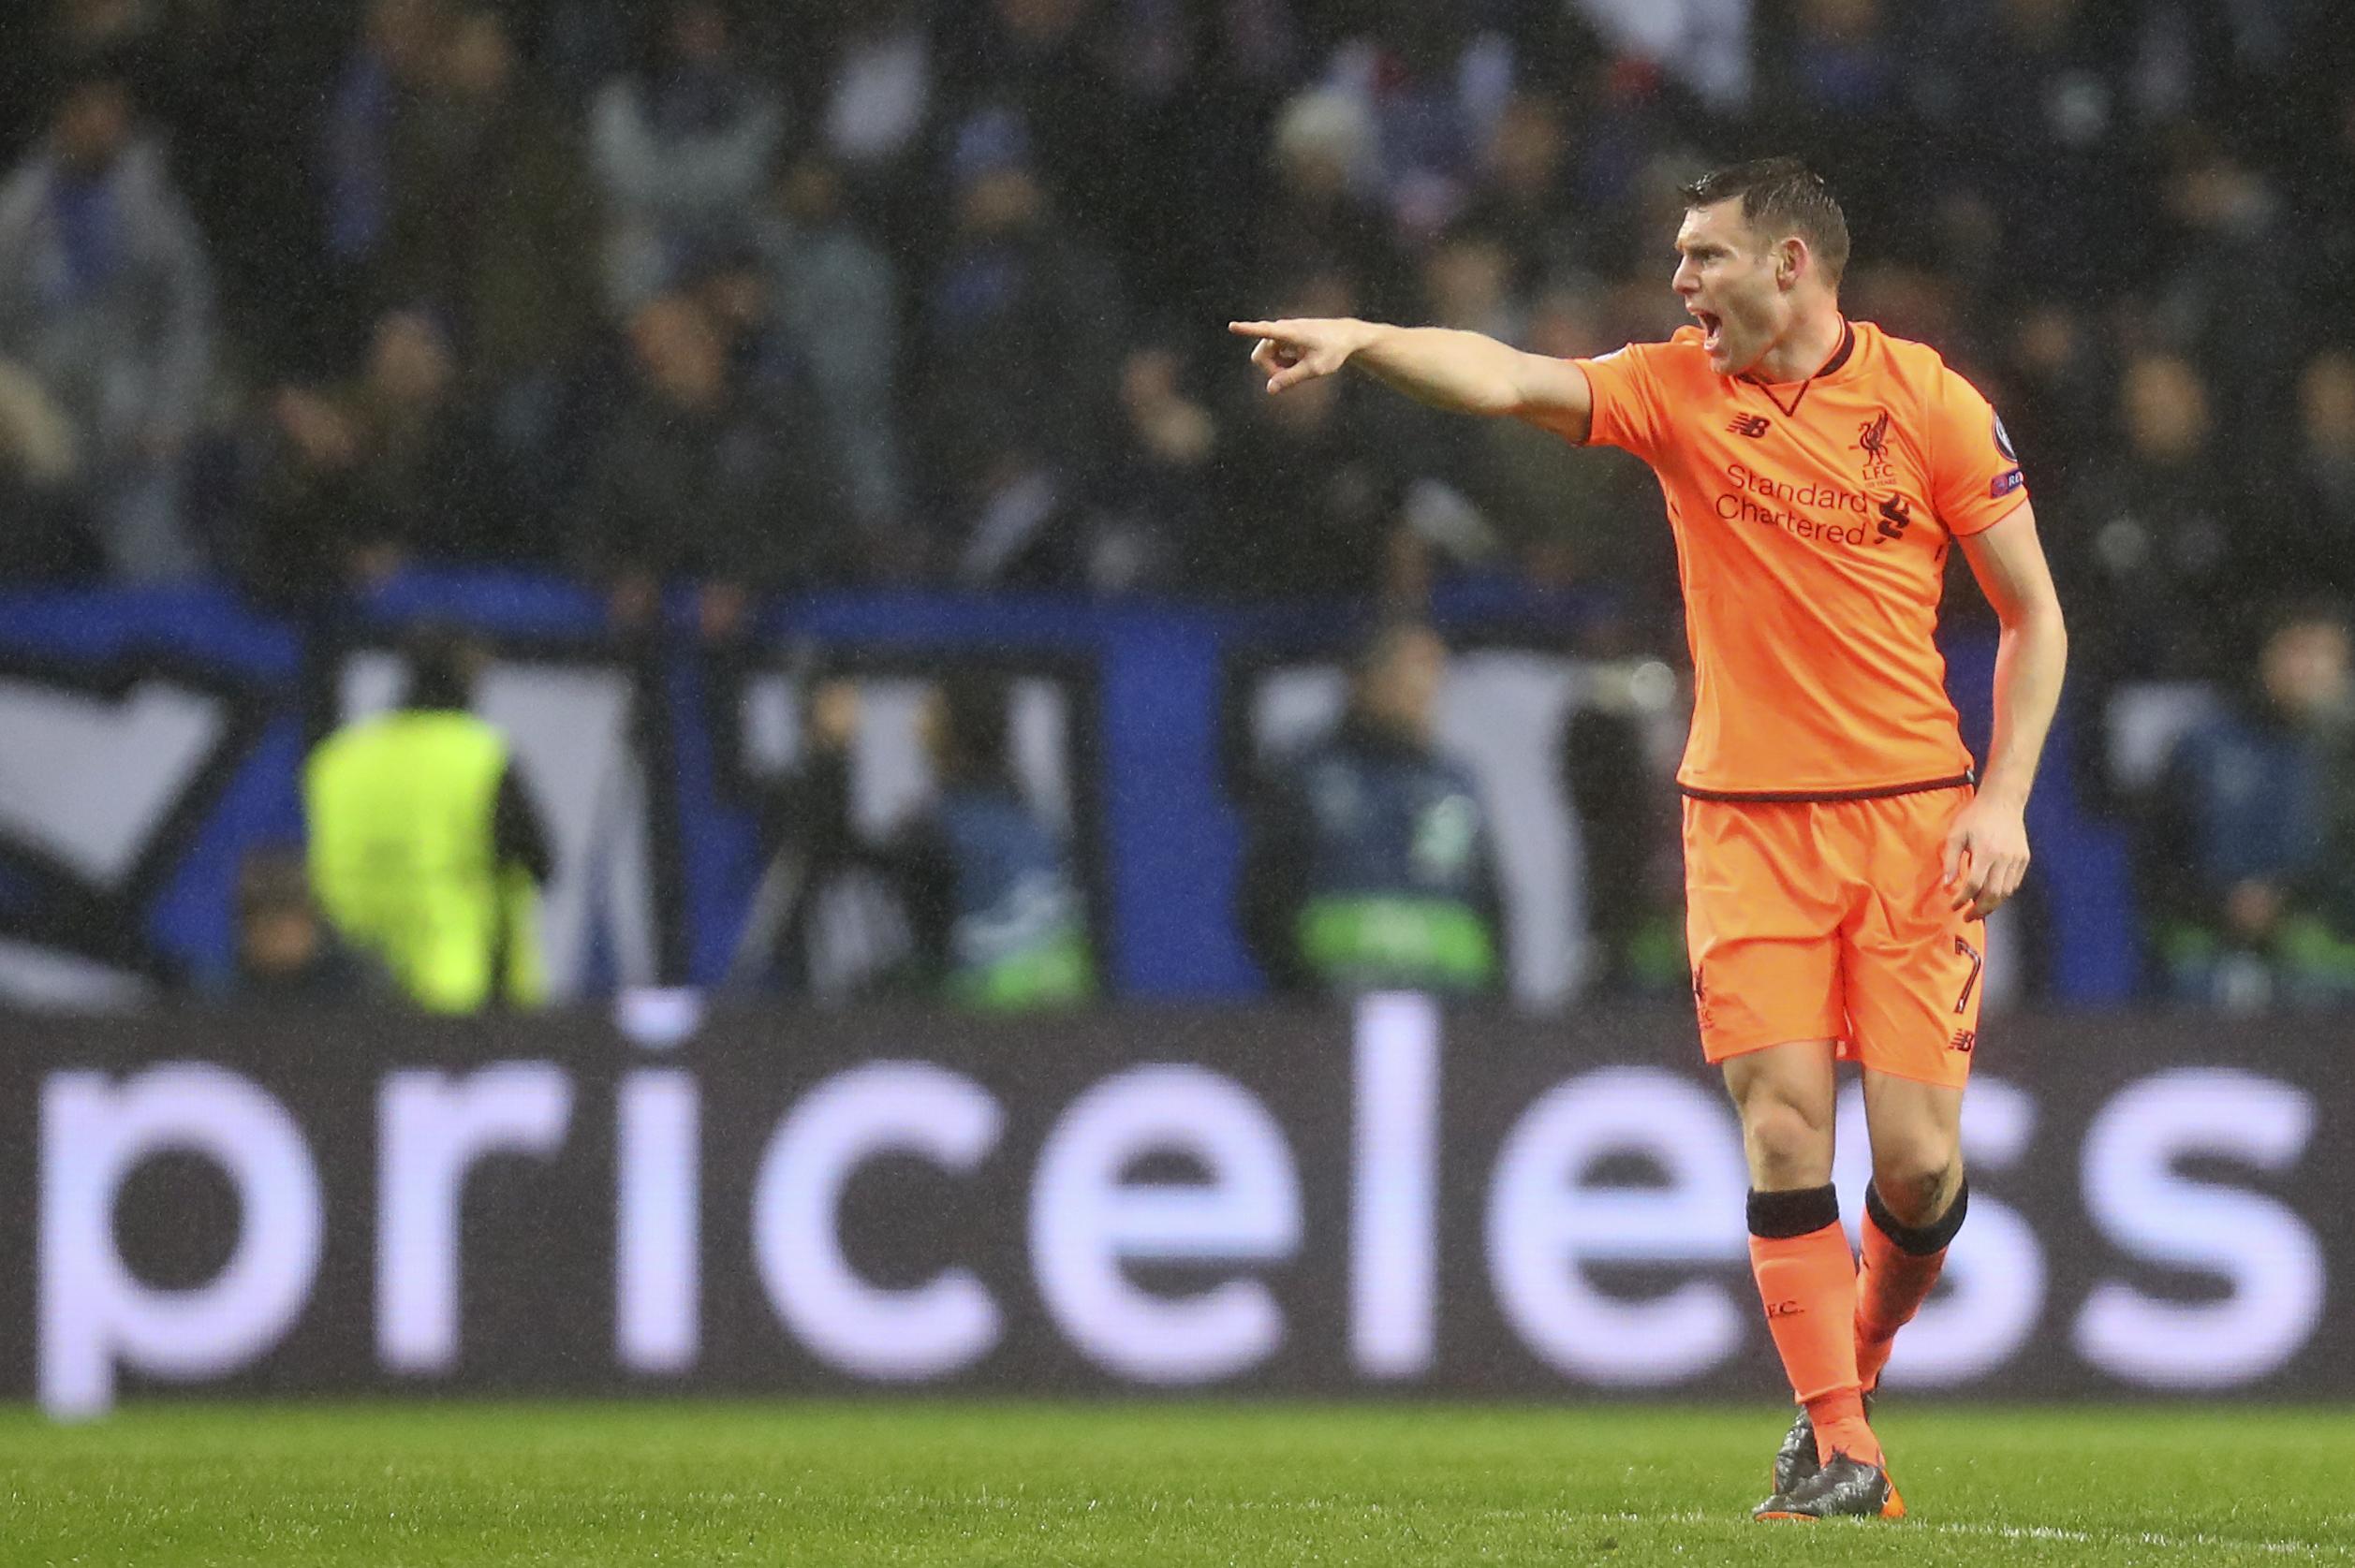 Manchester City won't ease up against Basel, says Vincent Kompany